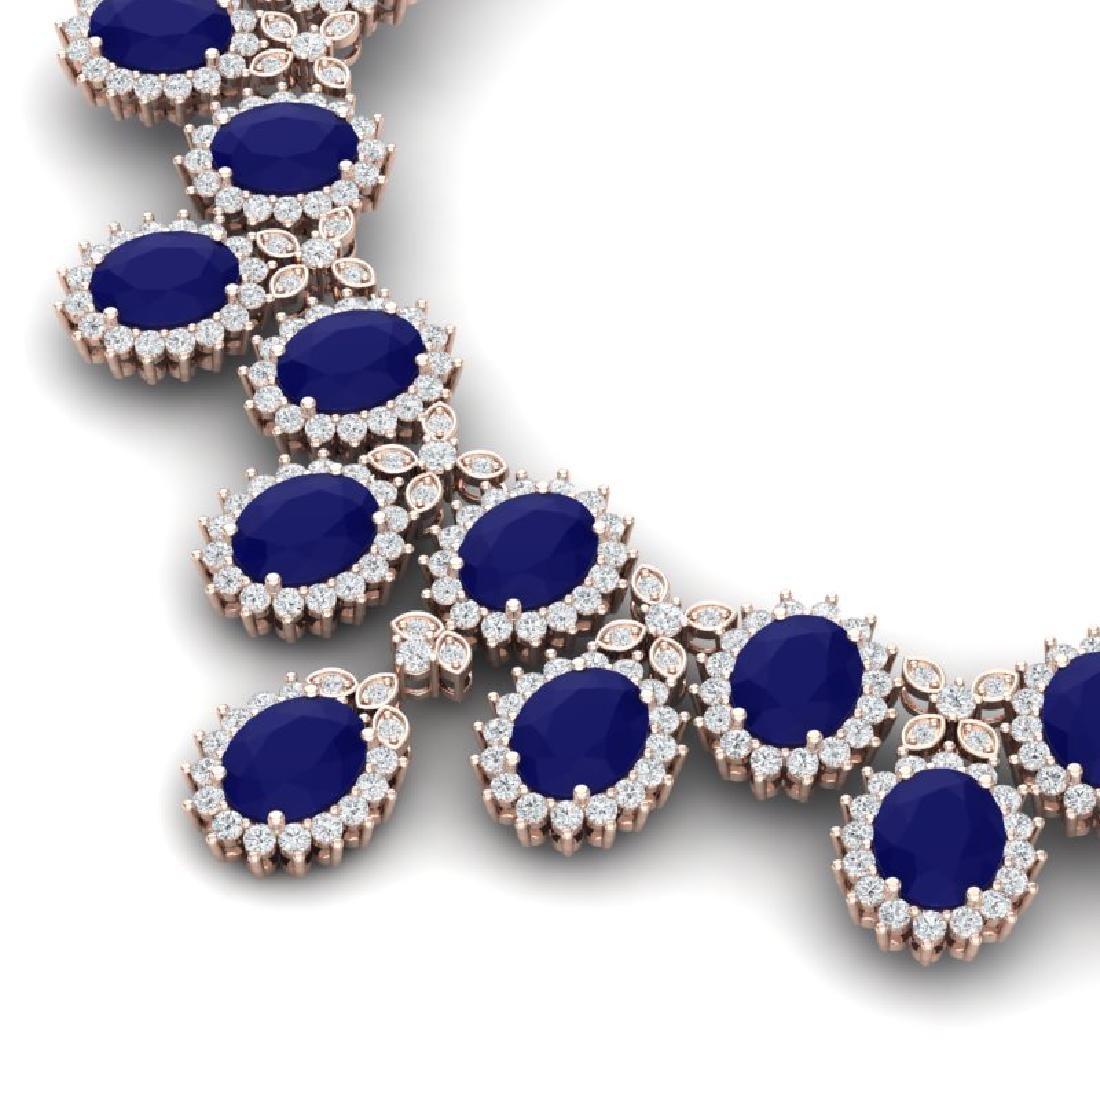 81 CTW Royalty Sapphire & VS Diamond Necklace 18K Rose - 2